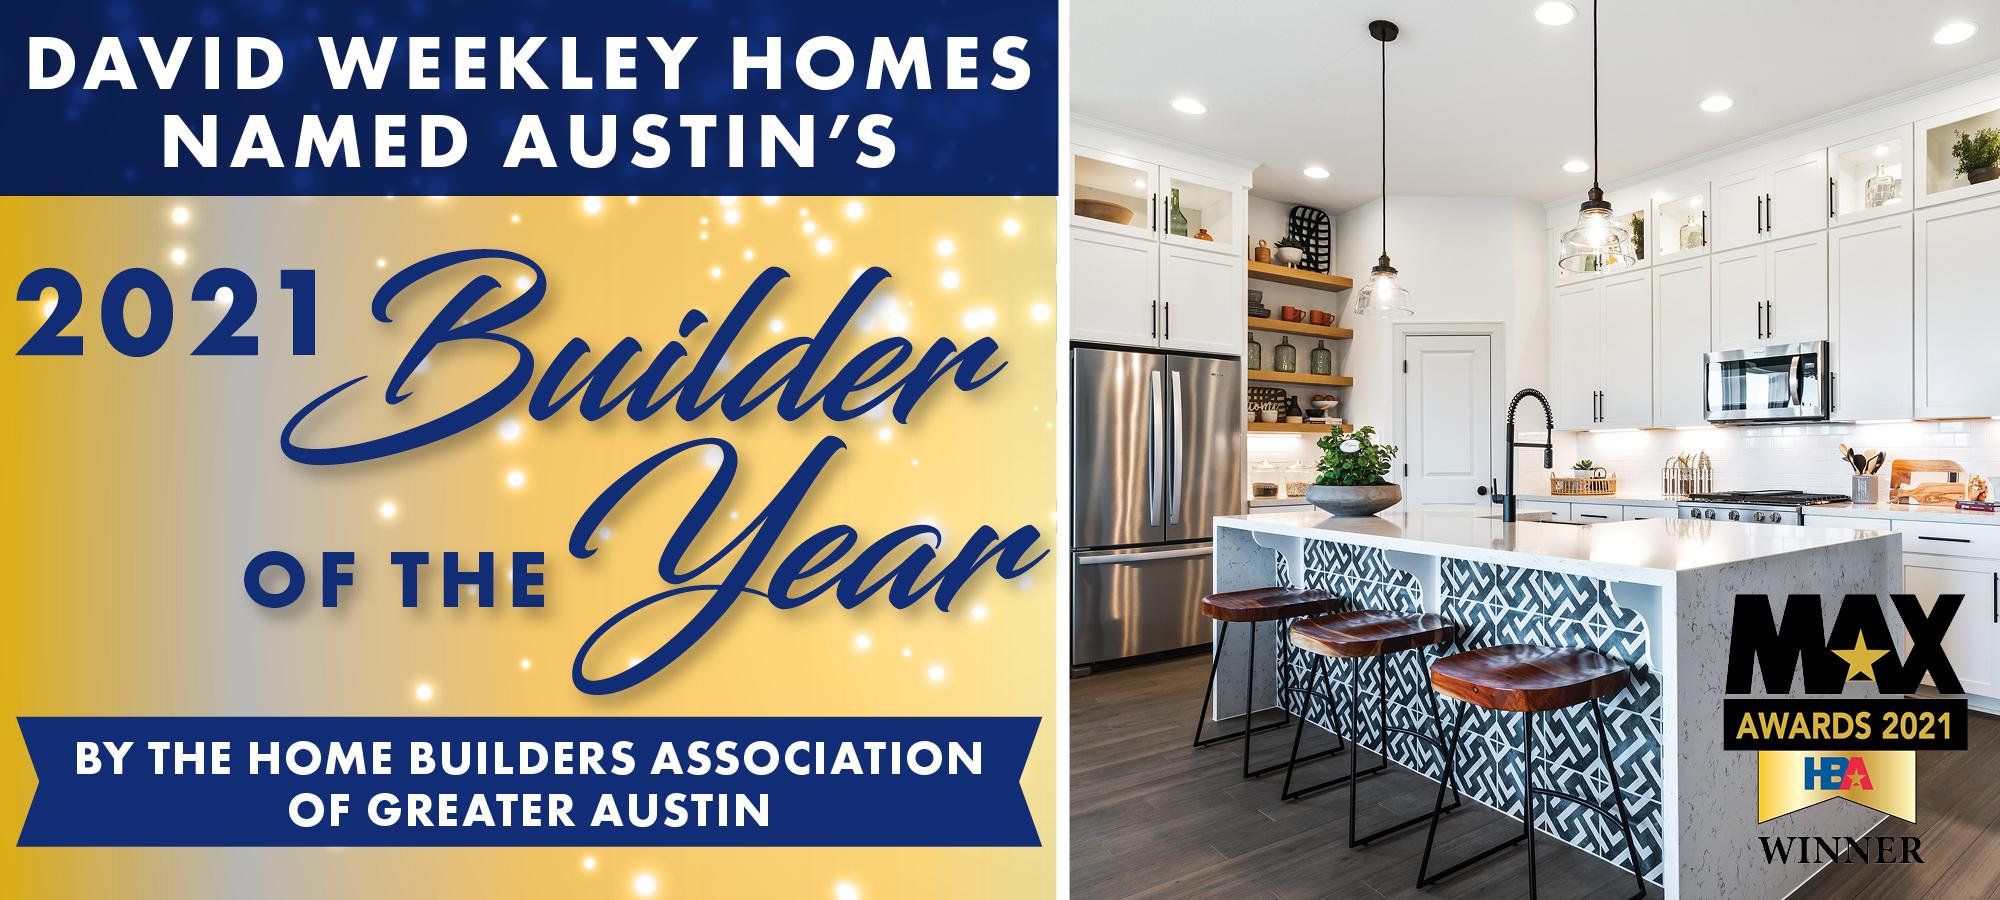 David Weekley Homes Wins Builder of the Year in Austin!